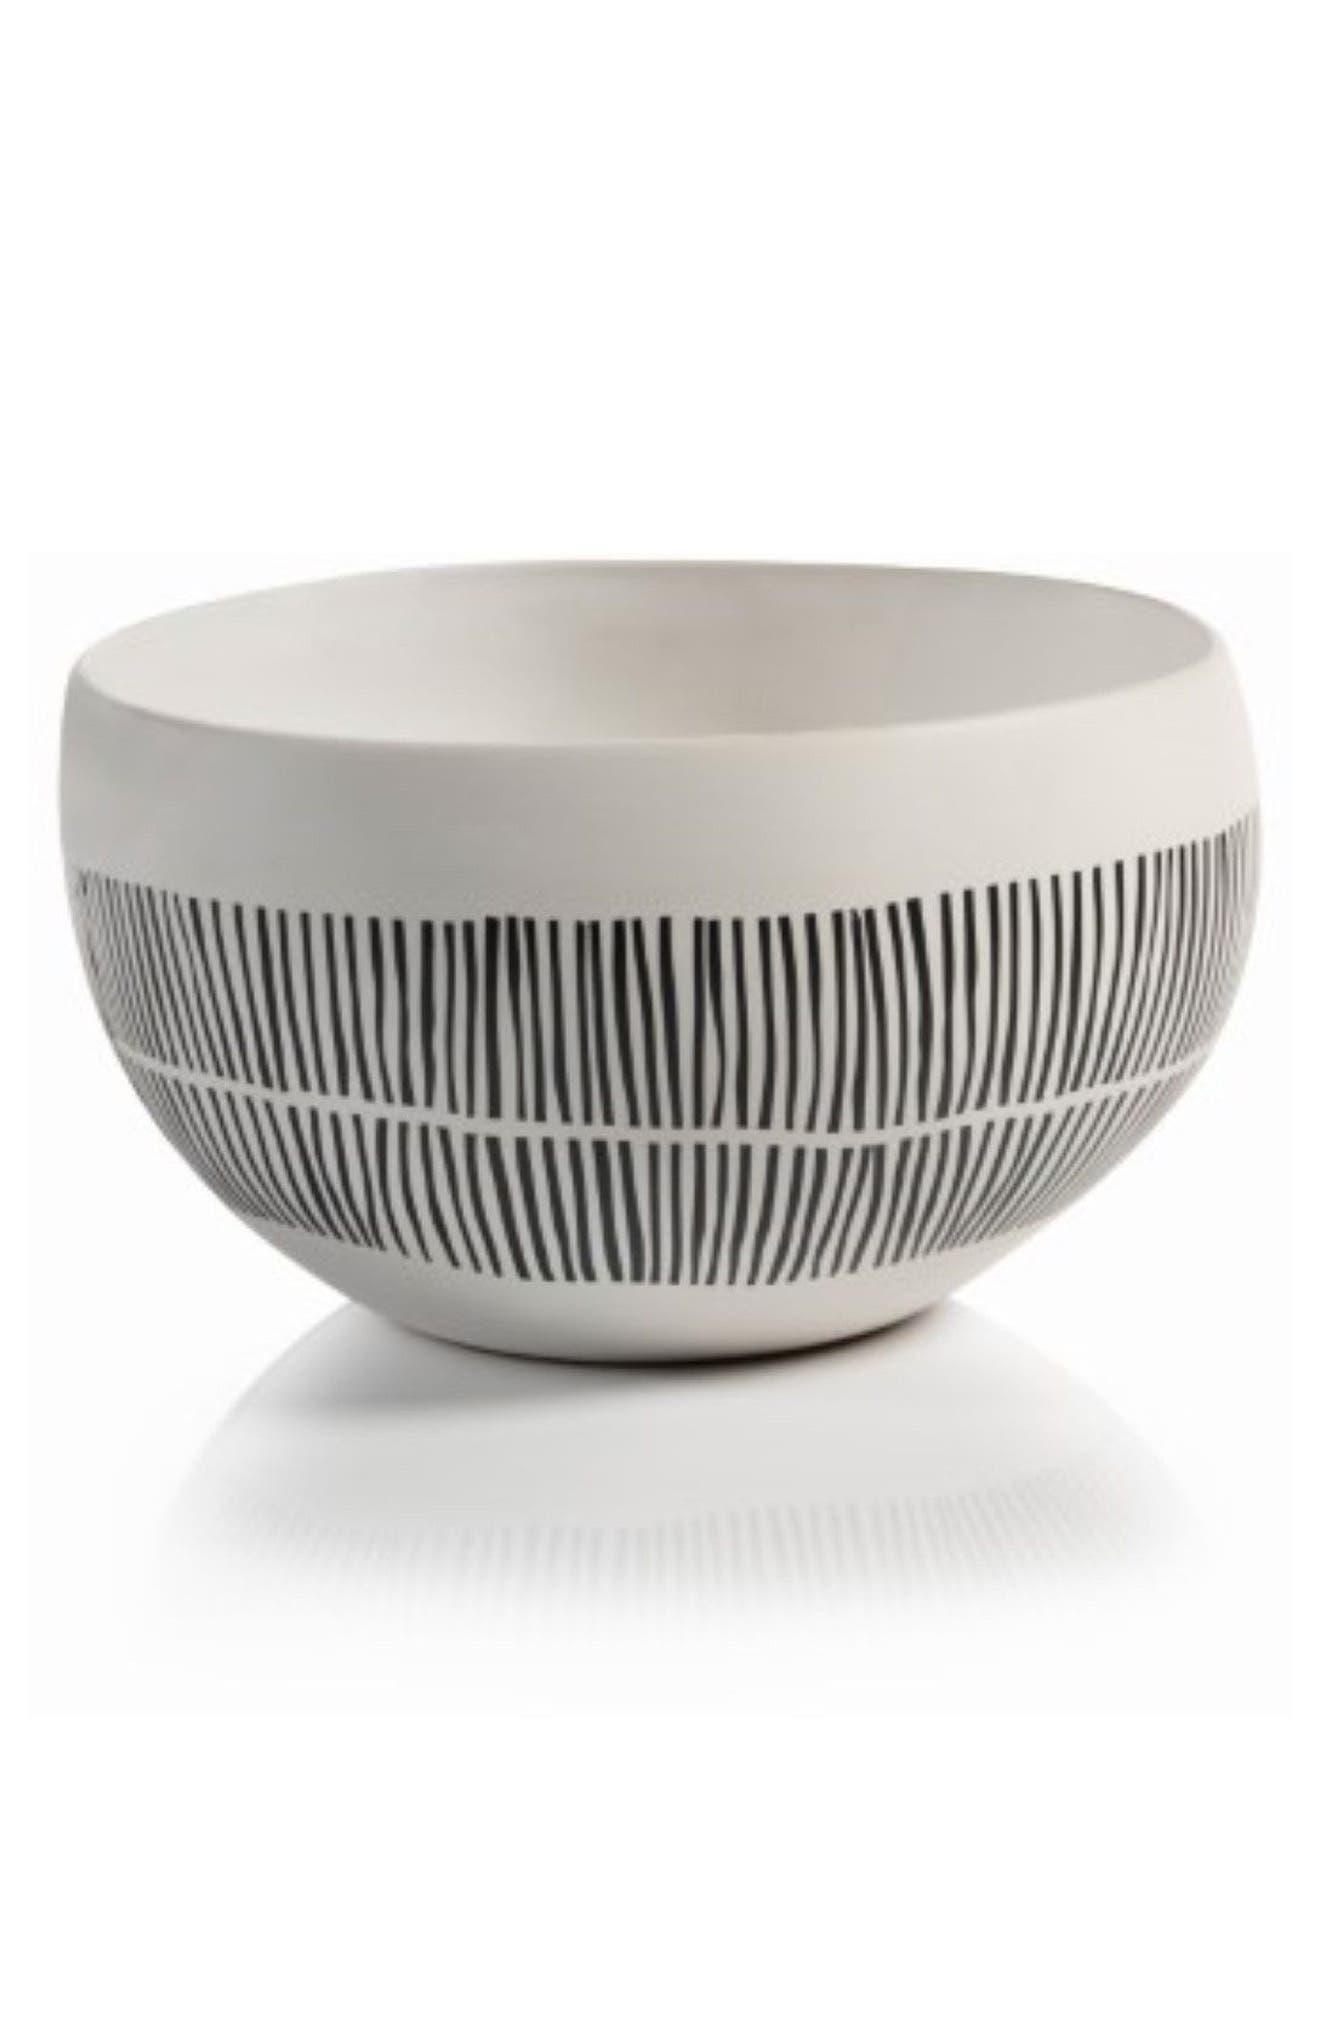 Marquesa Ceramic Bowl,                             Main thumbnail 1, color,                             White